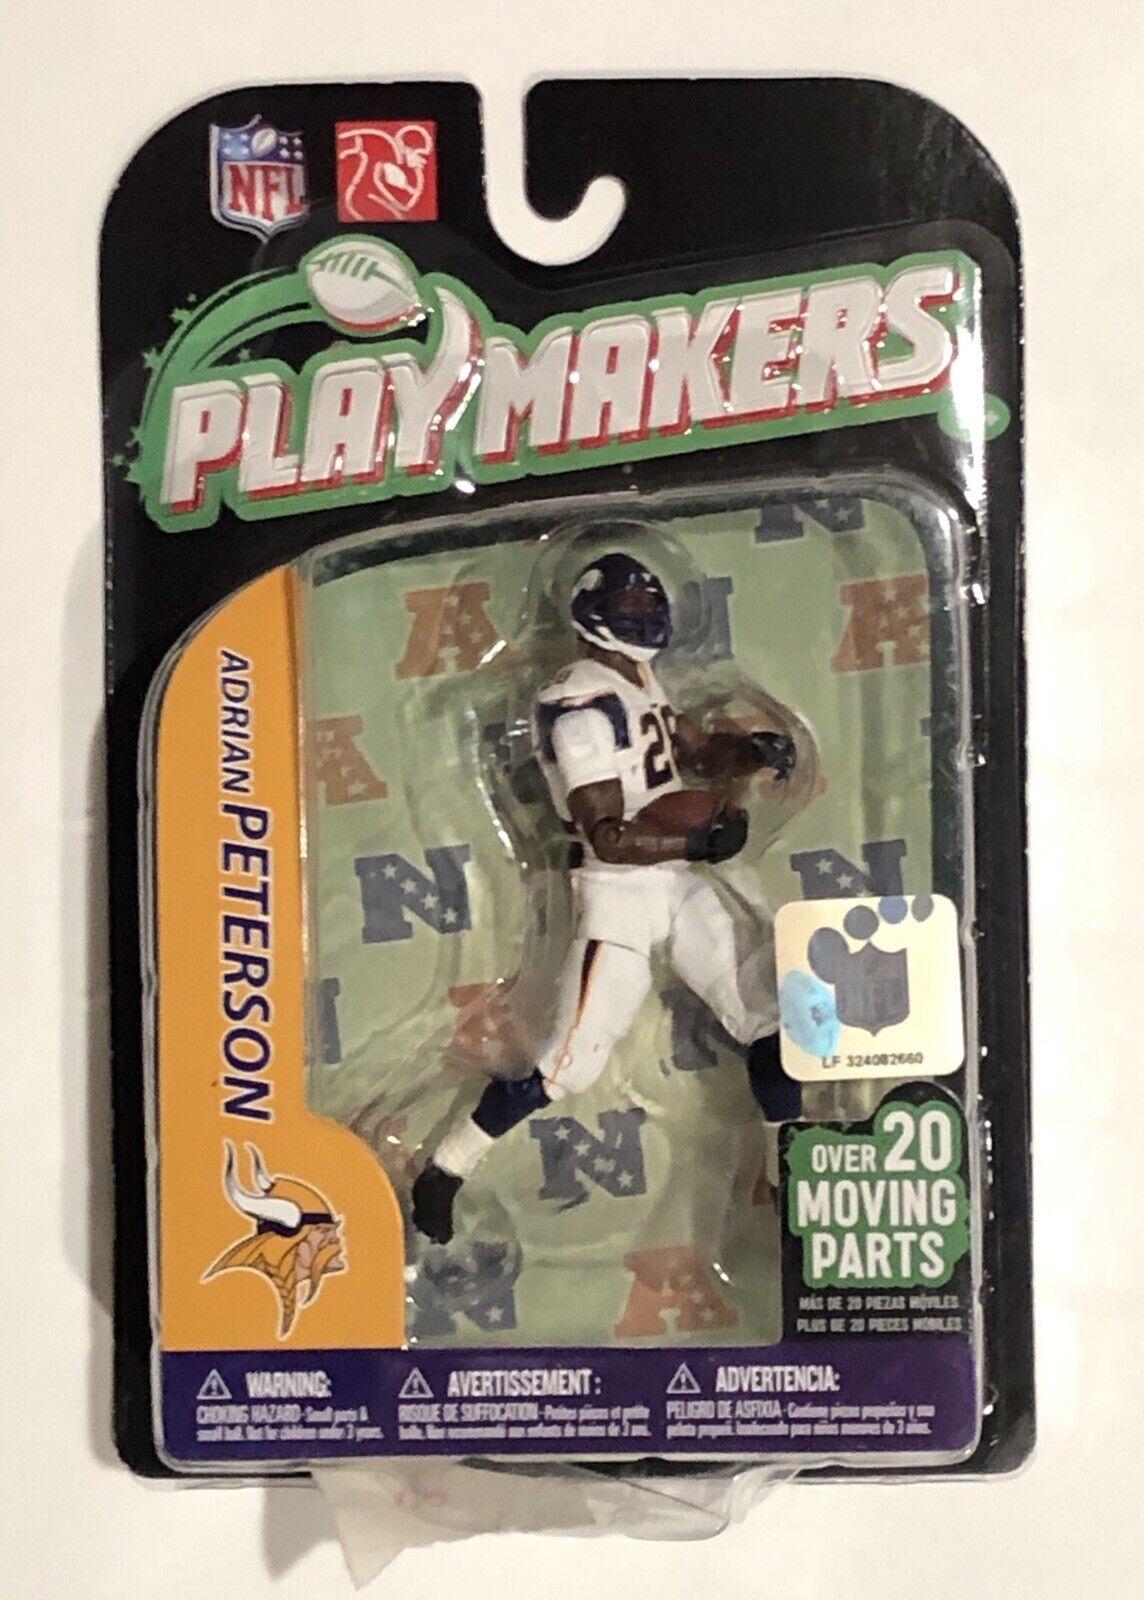 NIB 2011 Adrian Peterson Minnesota Vikings McFarlane Toys NFL Playmakers Figure